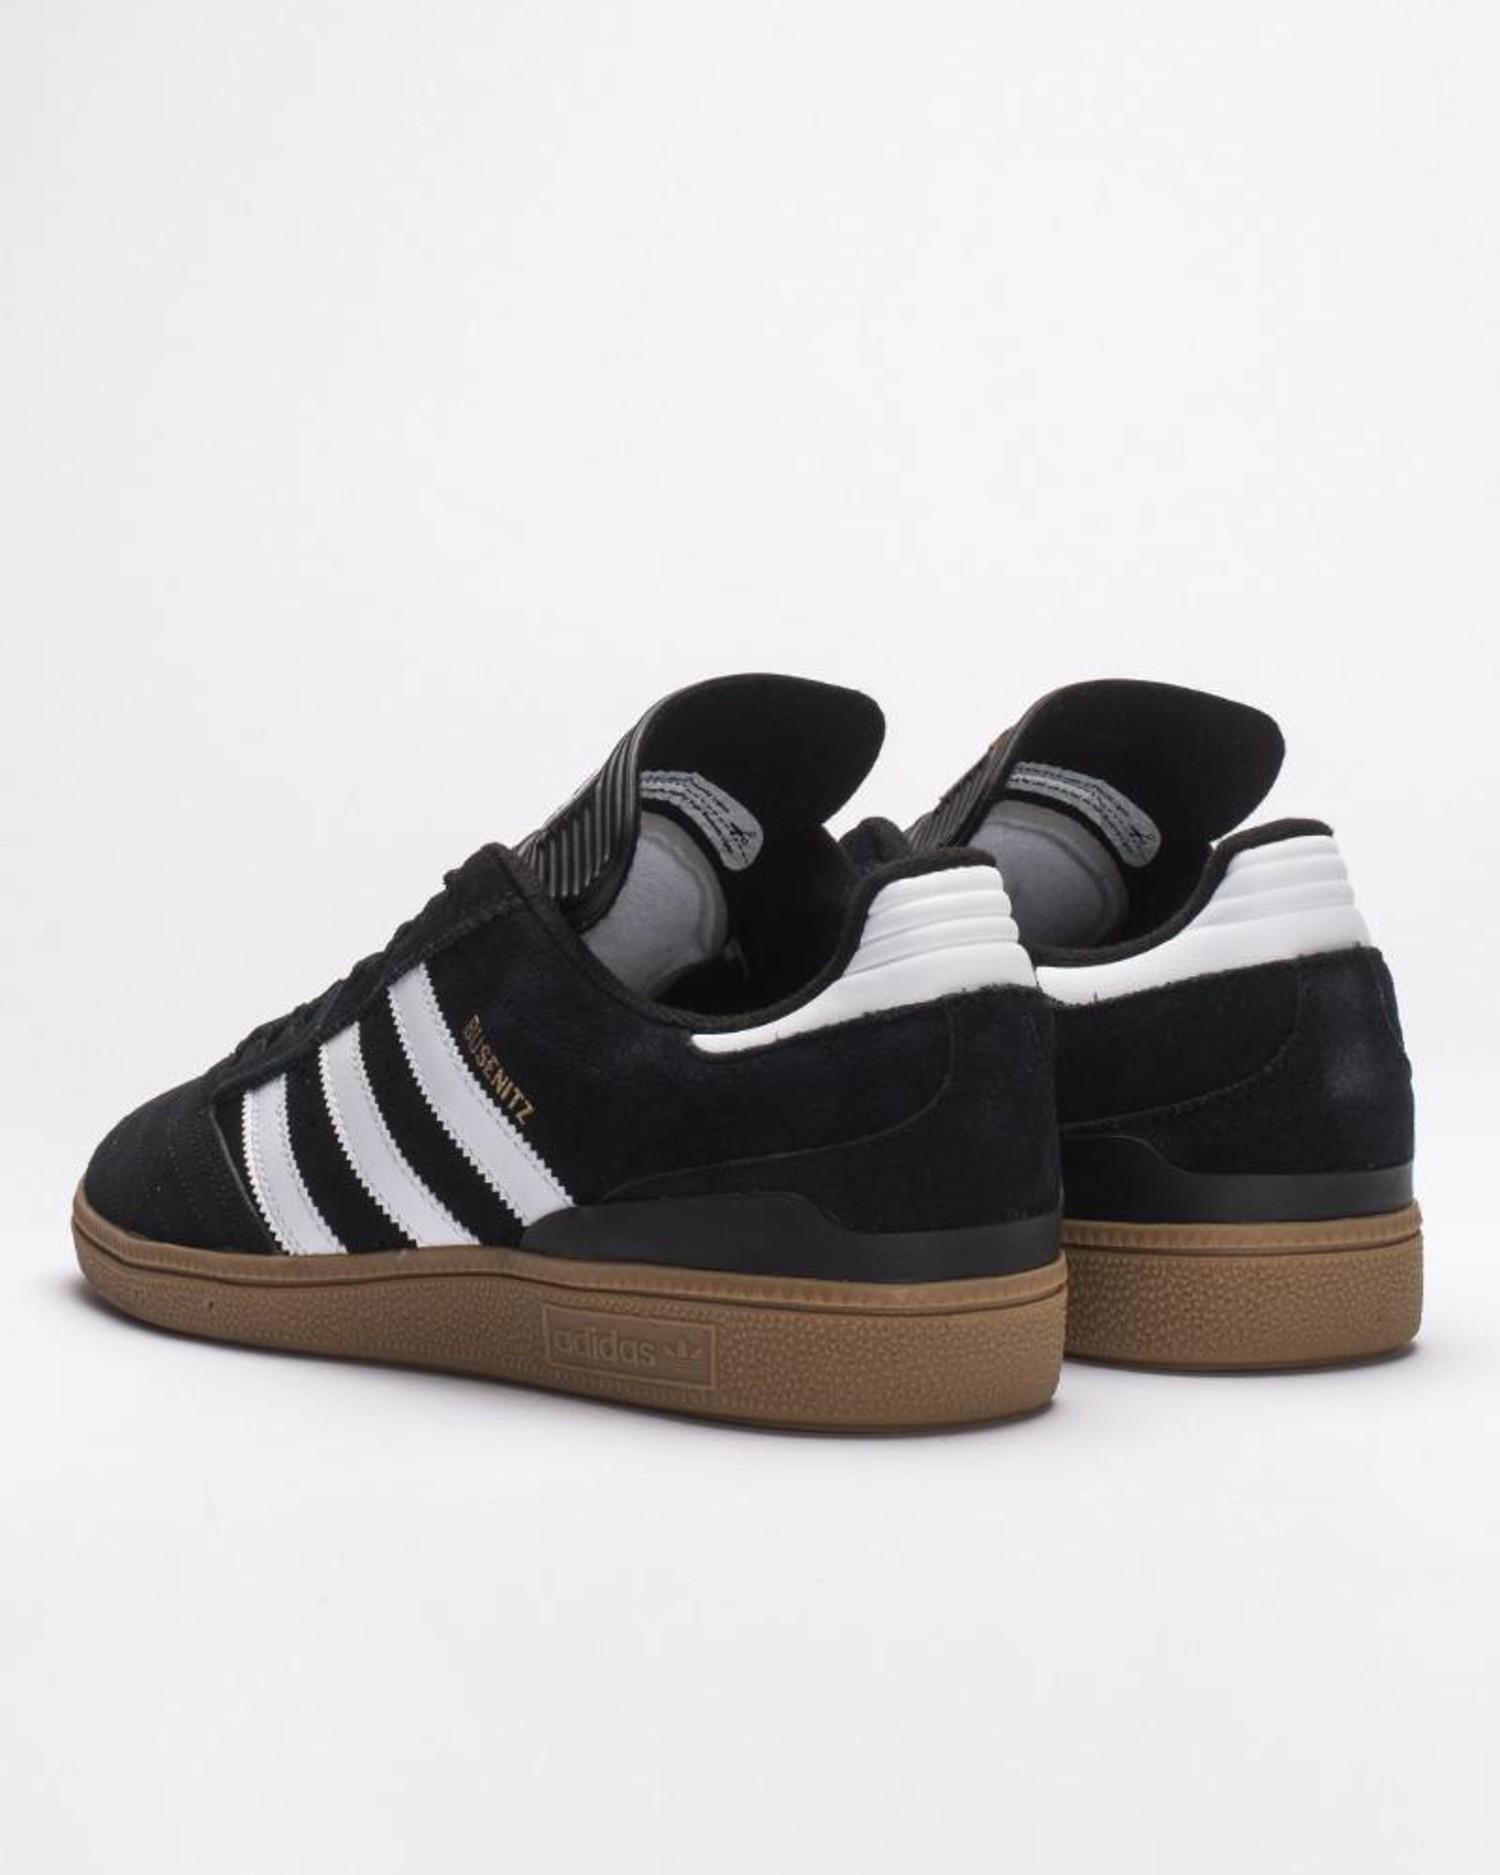 adidas Busenitz Black/White/Gum